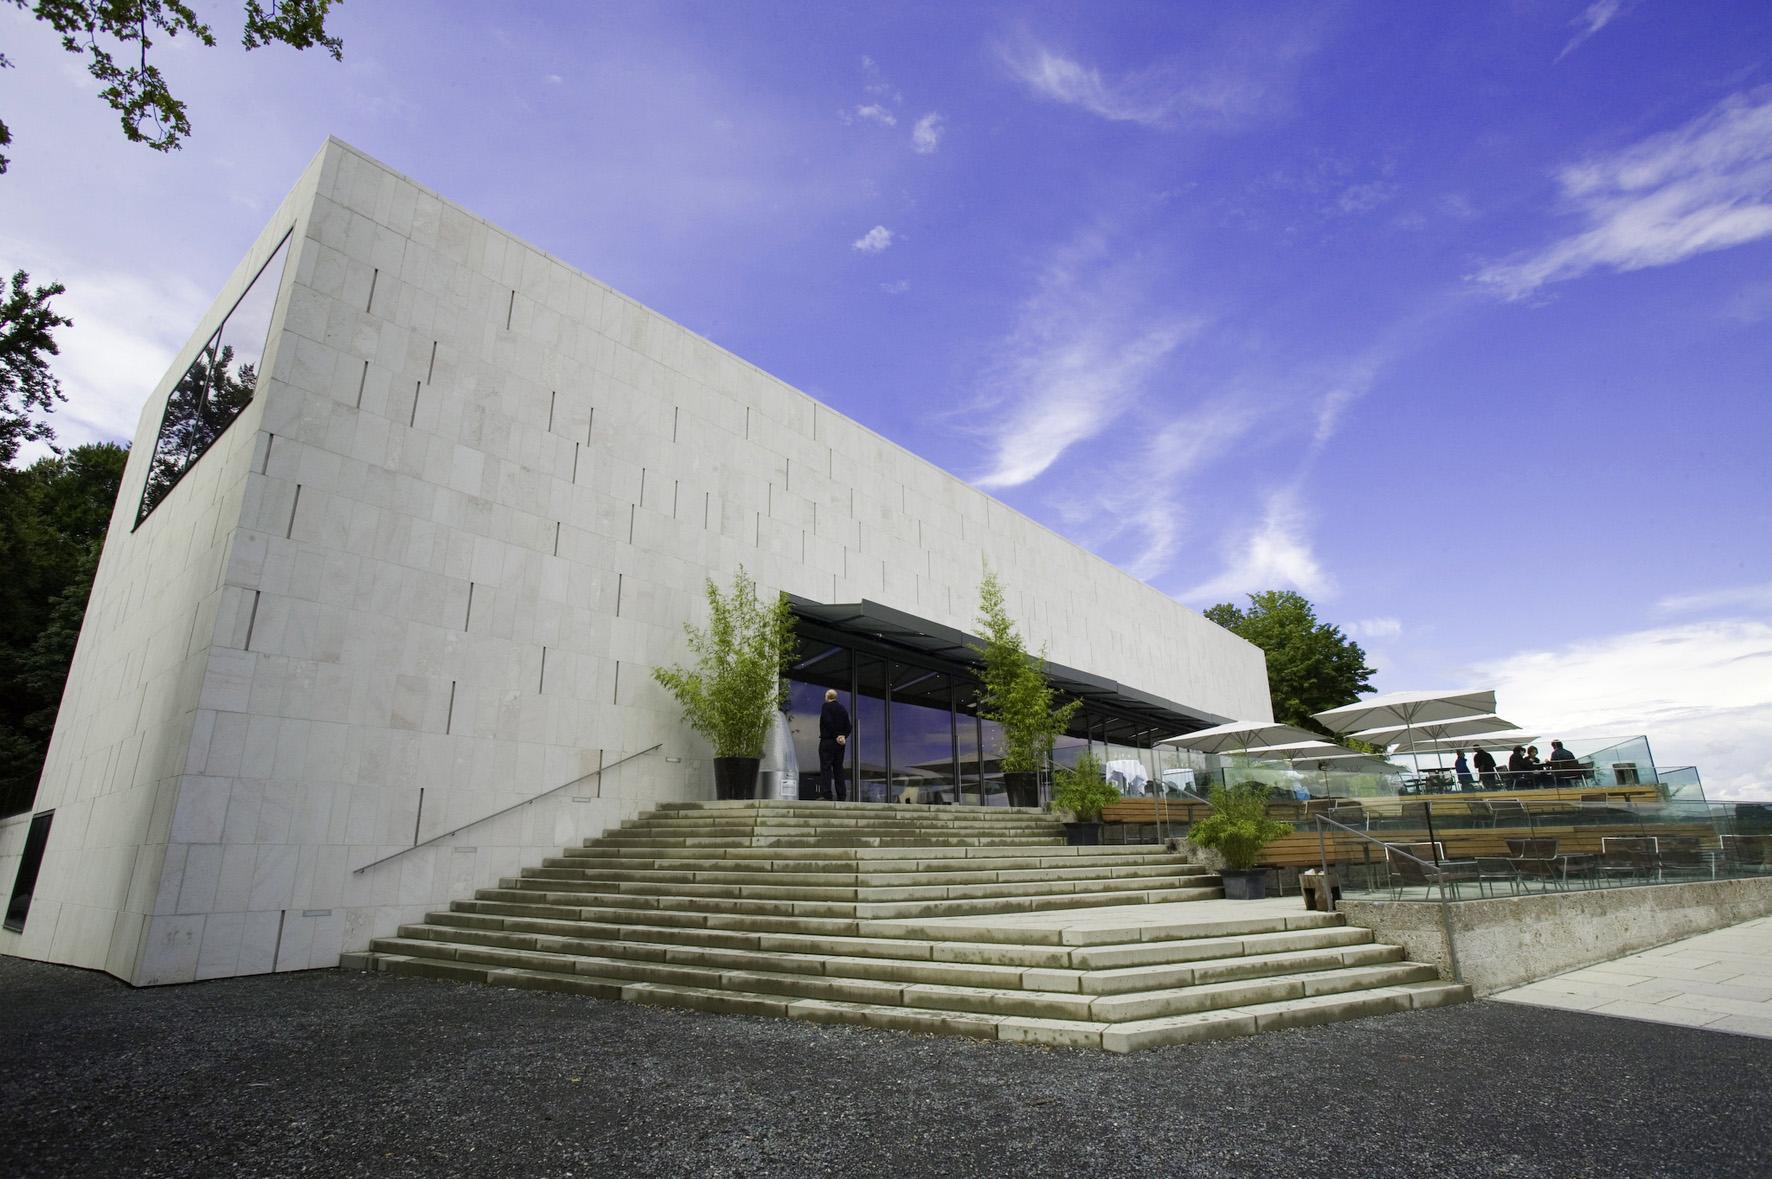 salzburg-muzeul-der-moderne-de-pe-monchsb-secret-world